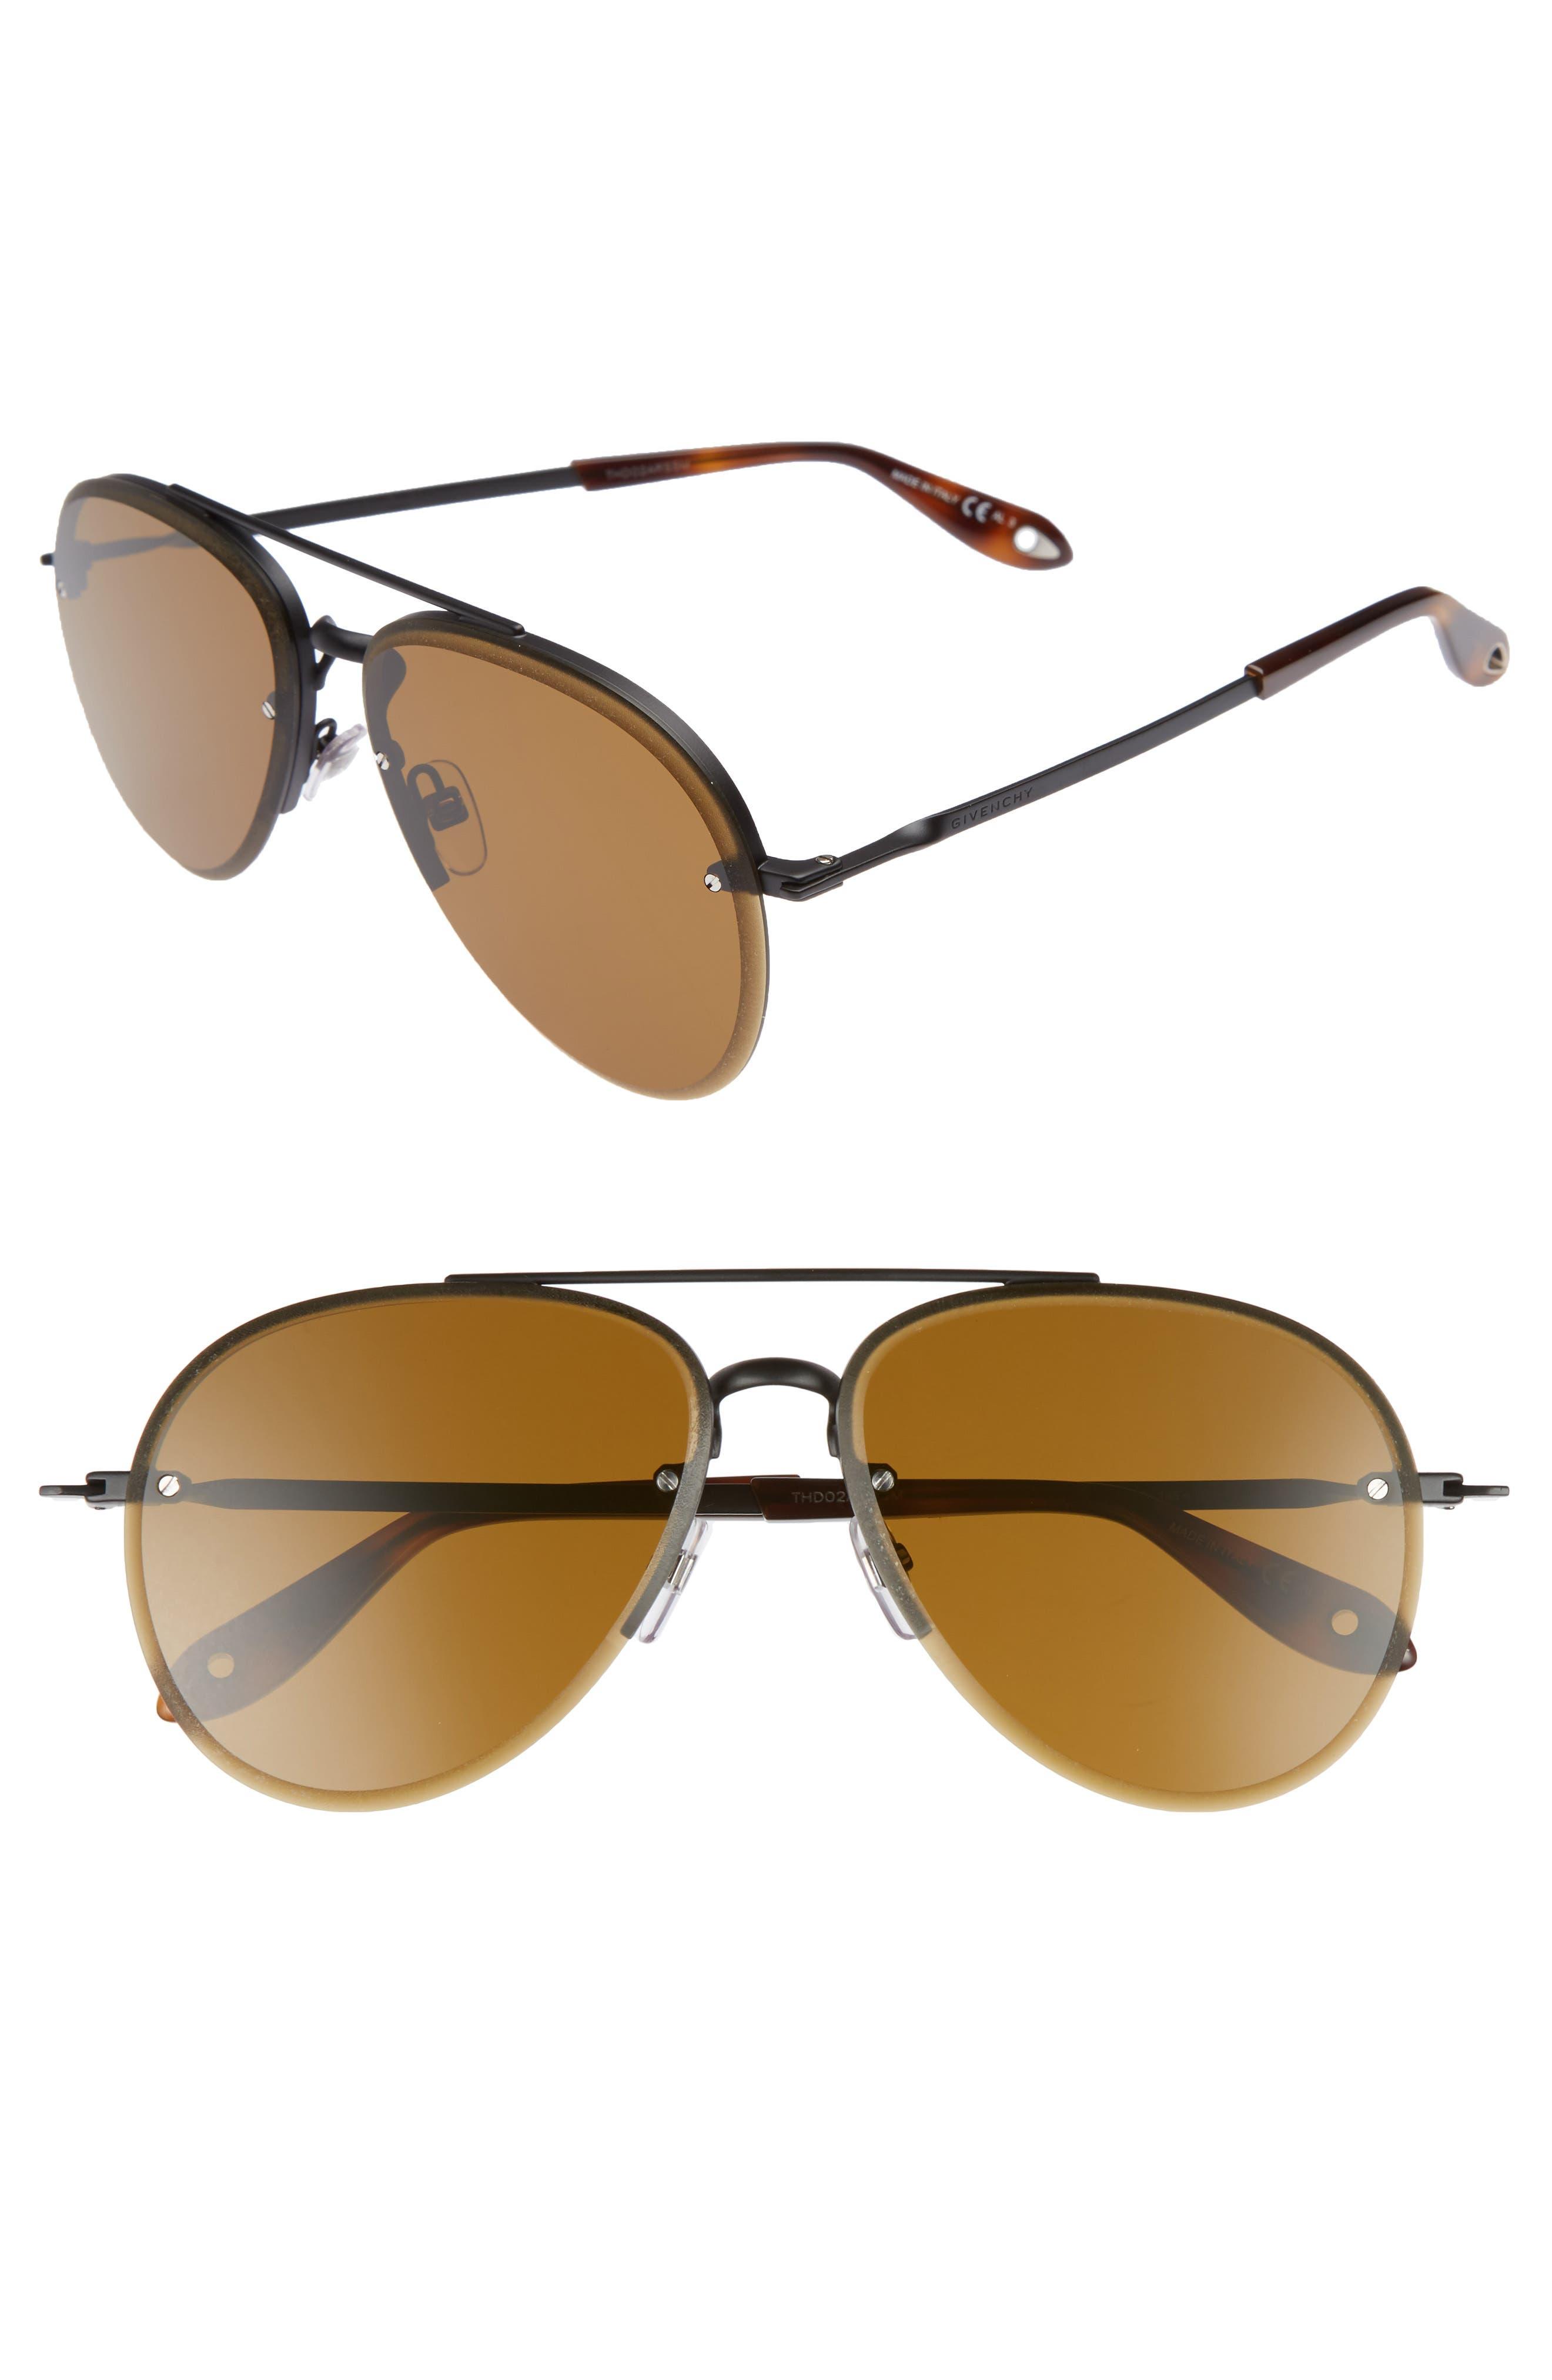 62mm Aviator Sunglasses,                         Main,                         color, Light Gold/ Gray Green